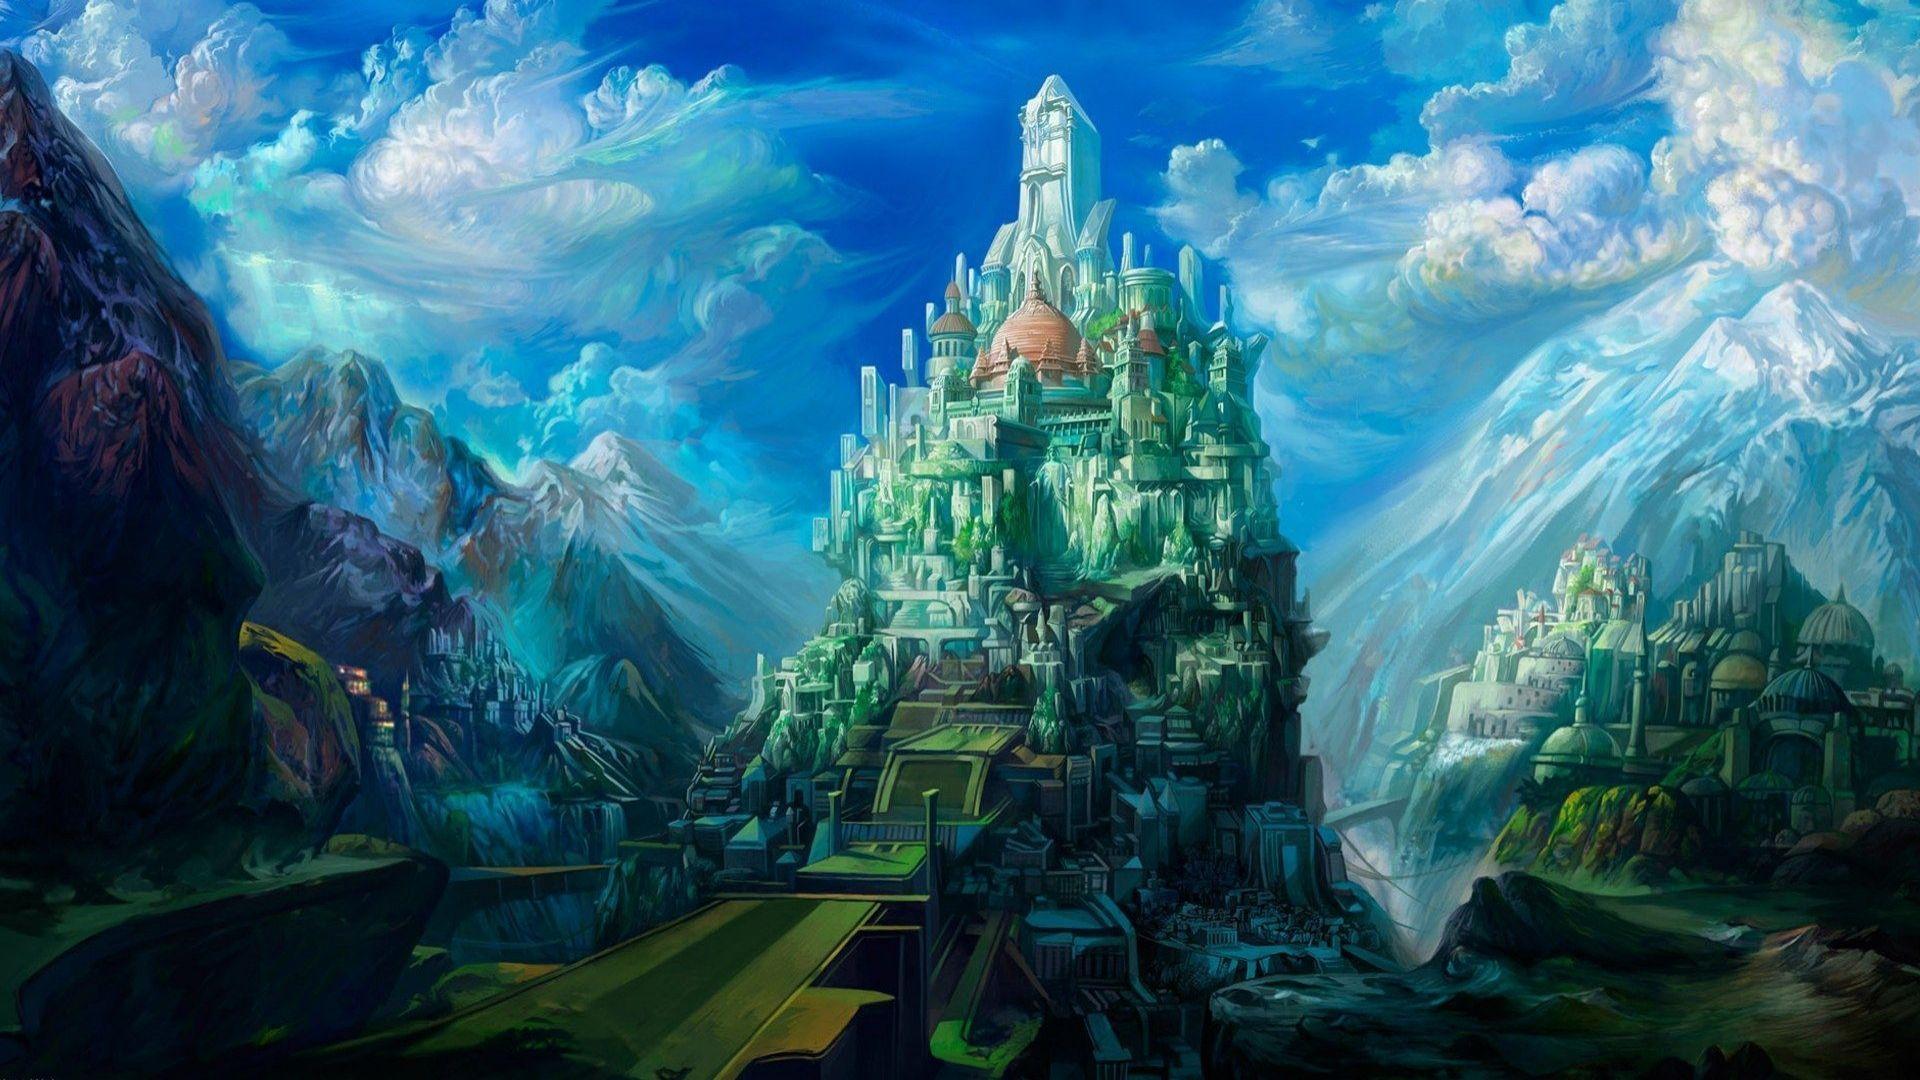 Drawn wallpaper castle 47783 Fantasy HD wallpaper Scenery